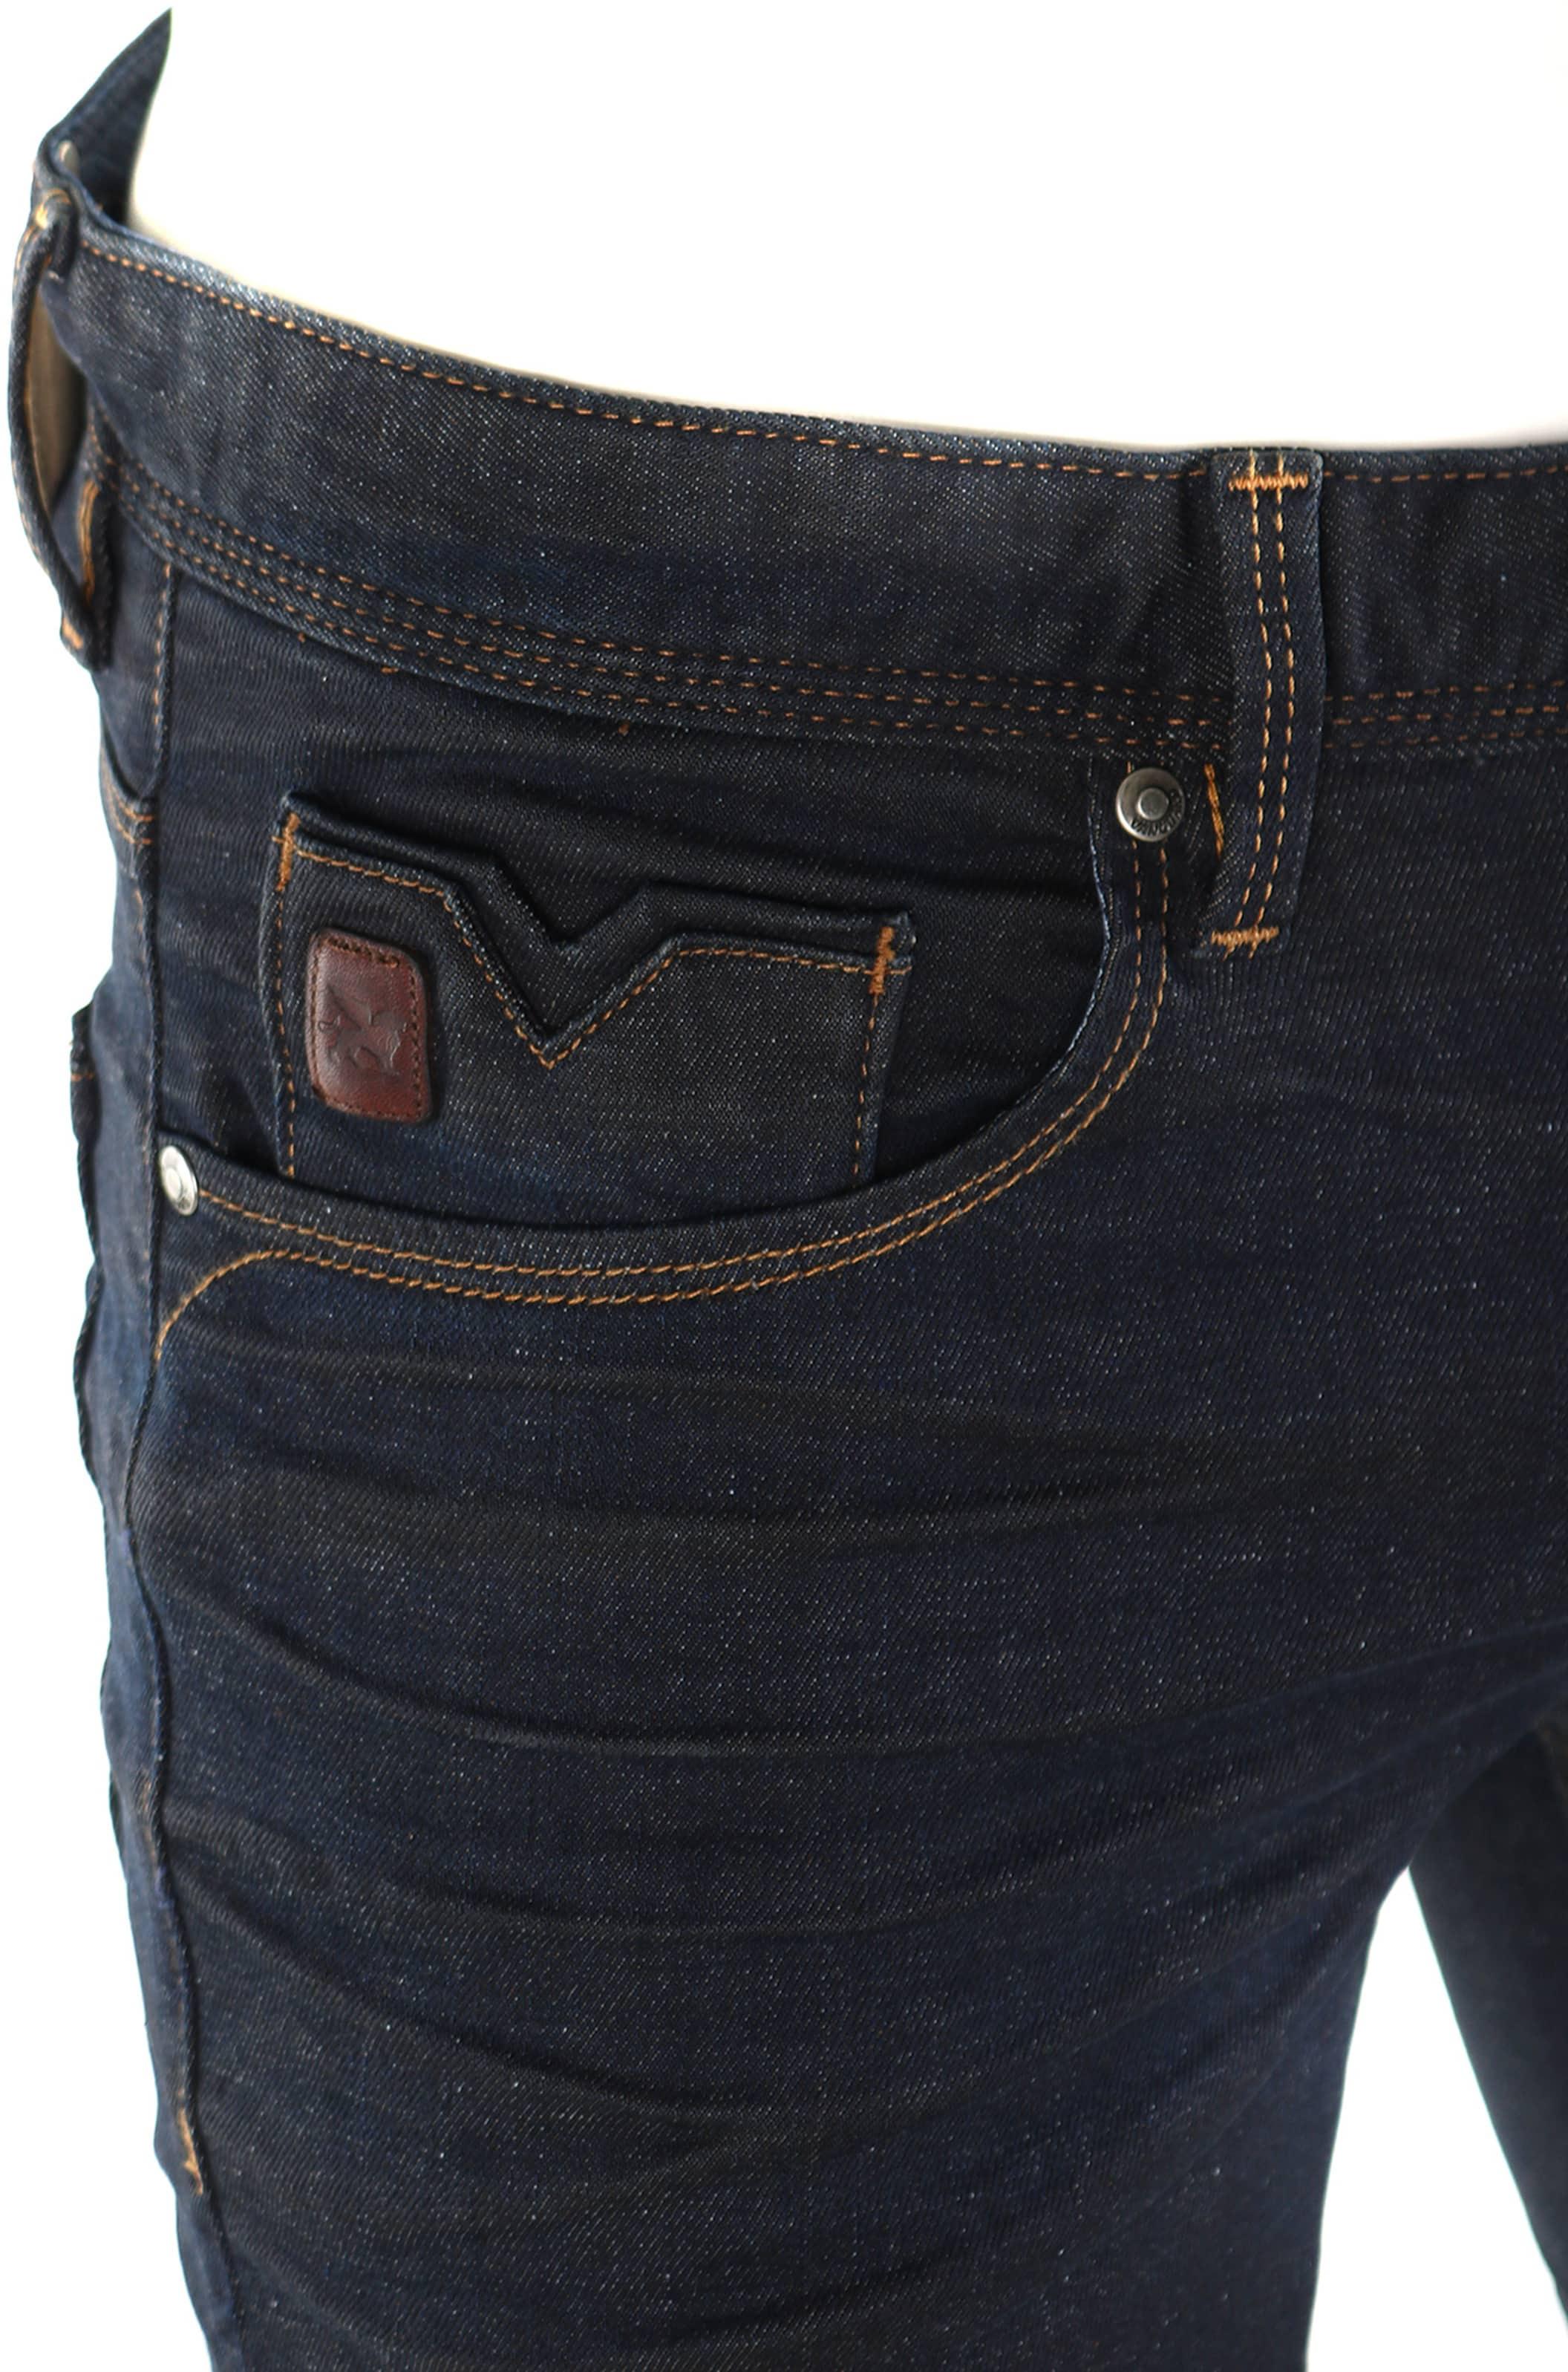 Vanguard V7 Rider Jeans Slim Fit CCR foto 1